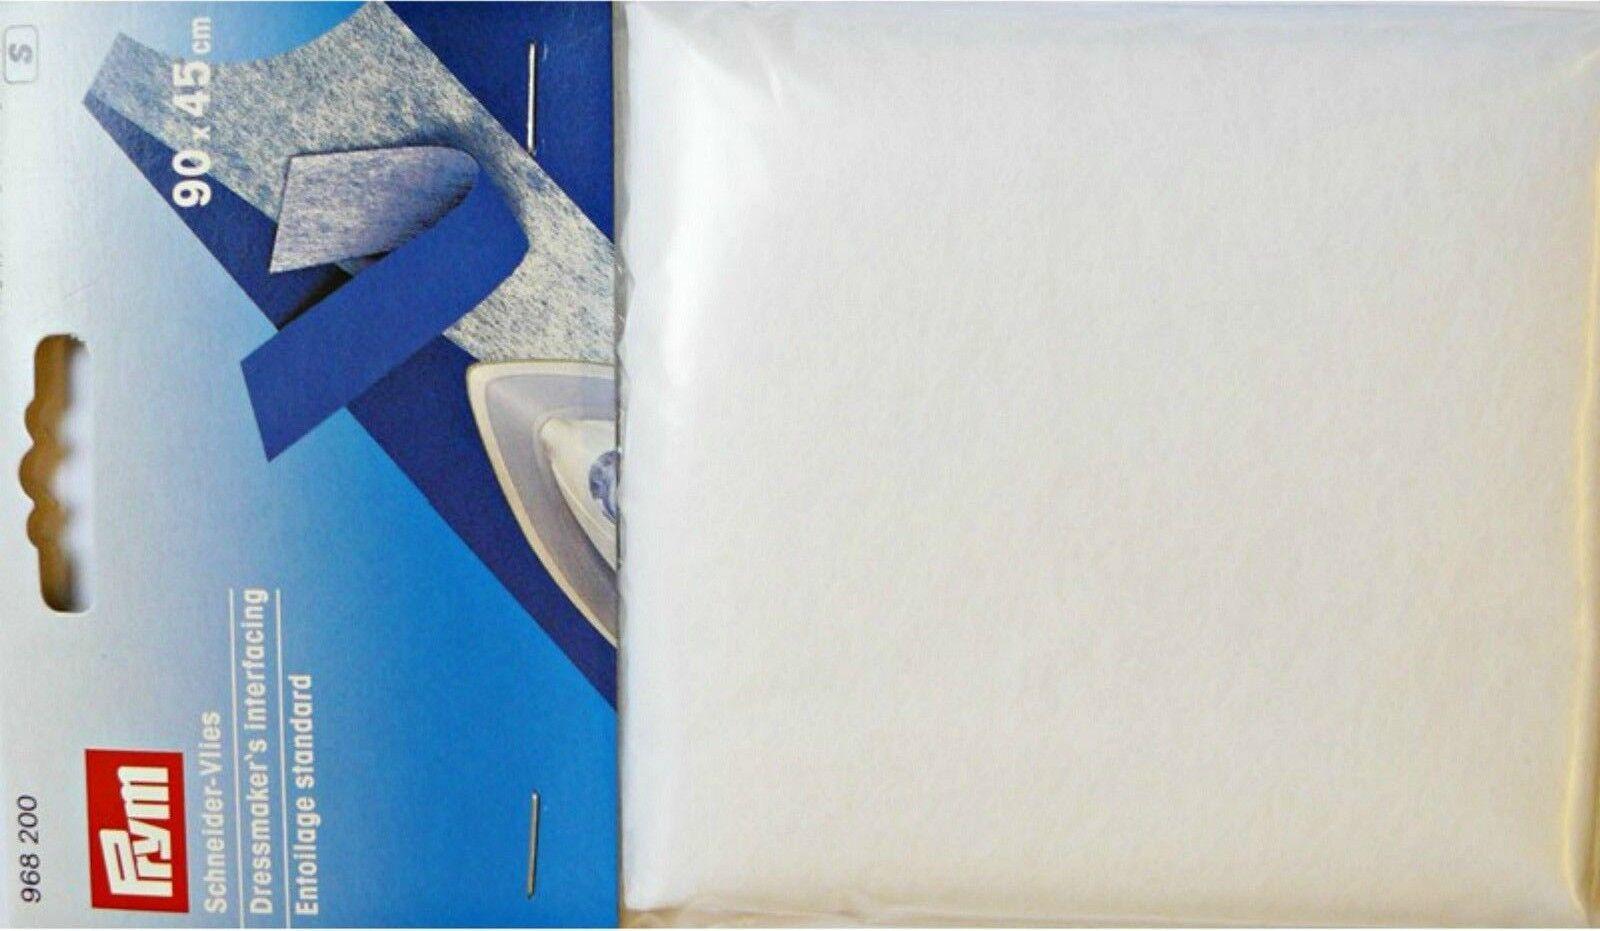 Prym Dressmakers Iron On Interfacing White